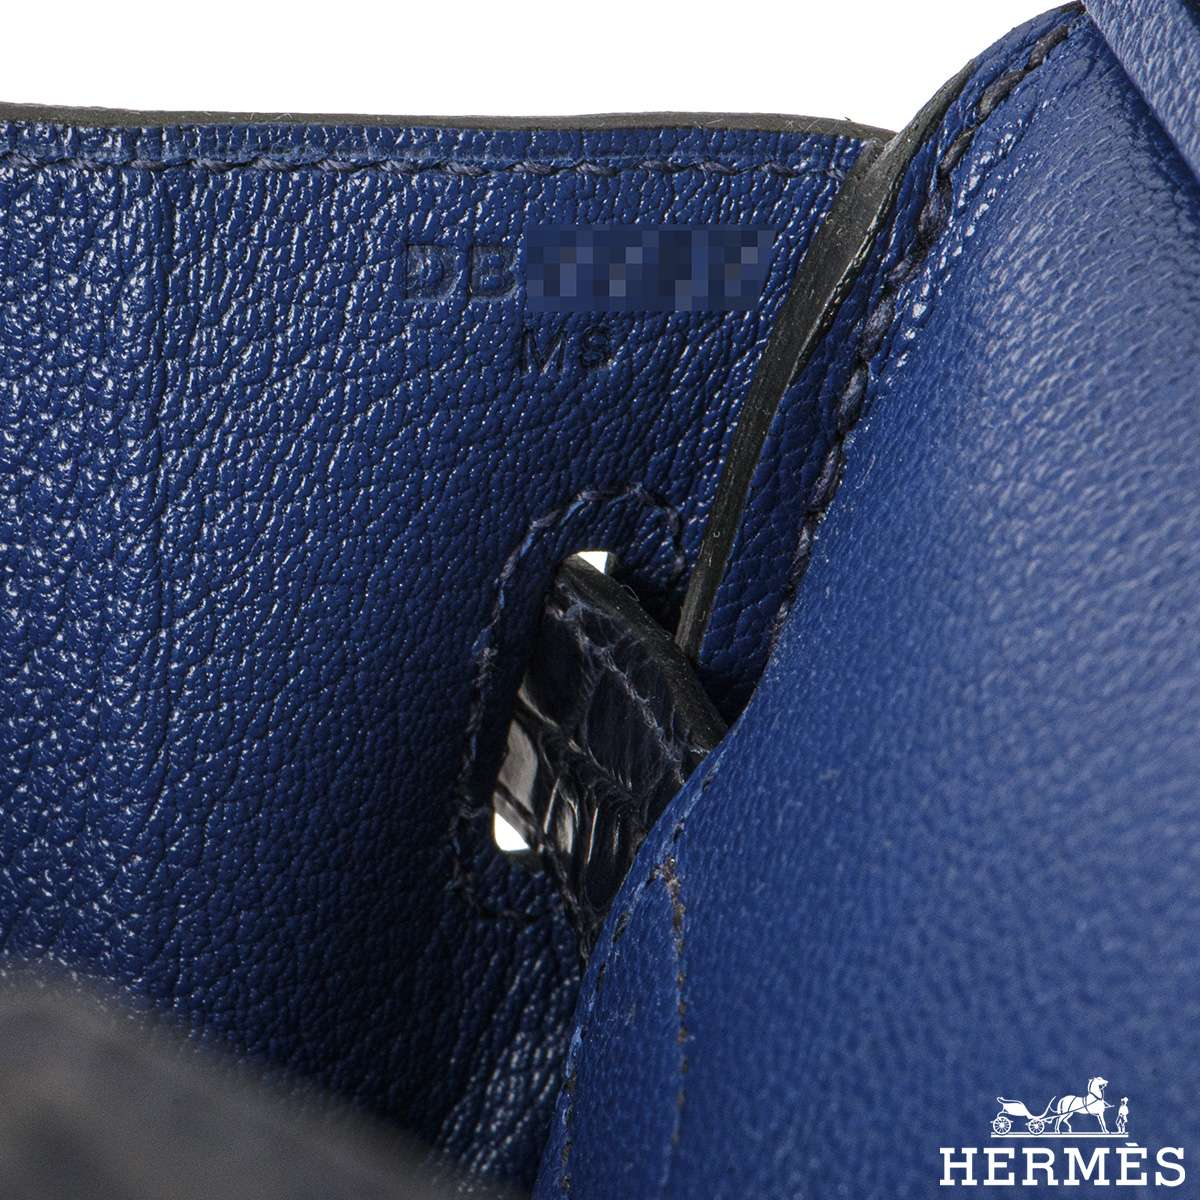 Hermès Birkin 30cm Bleu Saphir/Bleu Marine Touch Alligator/Novillo RGHW